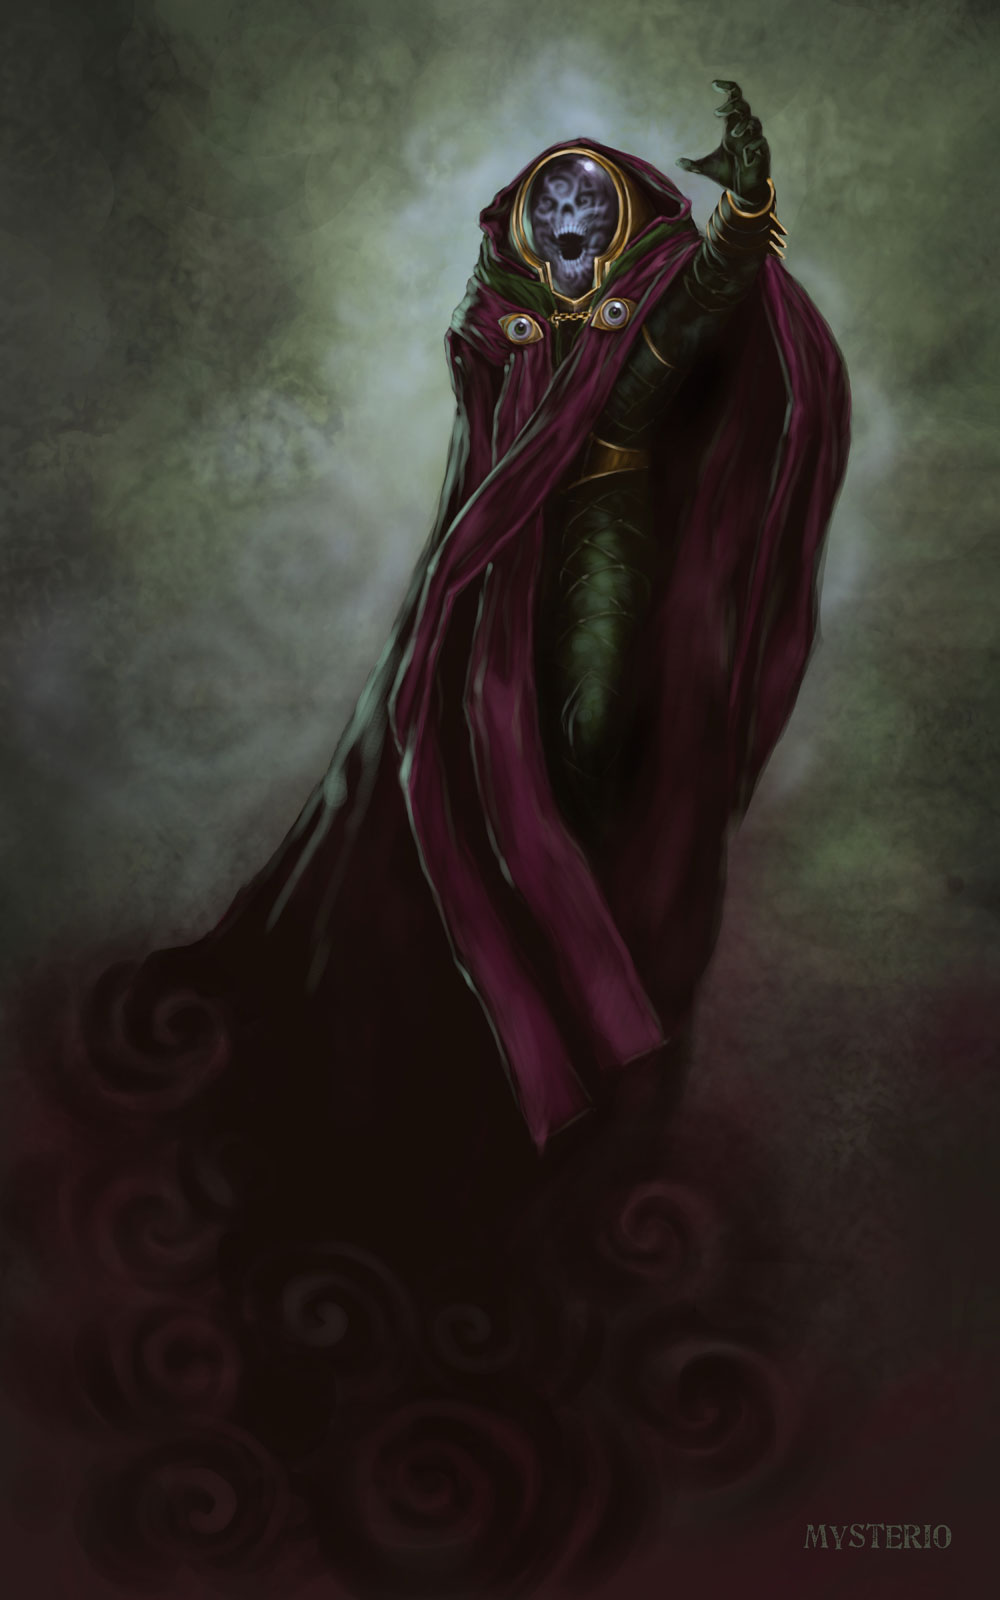 mysterio_color_06a.jpg